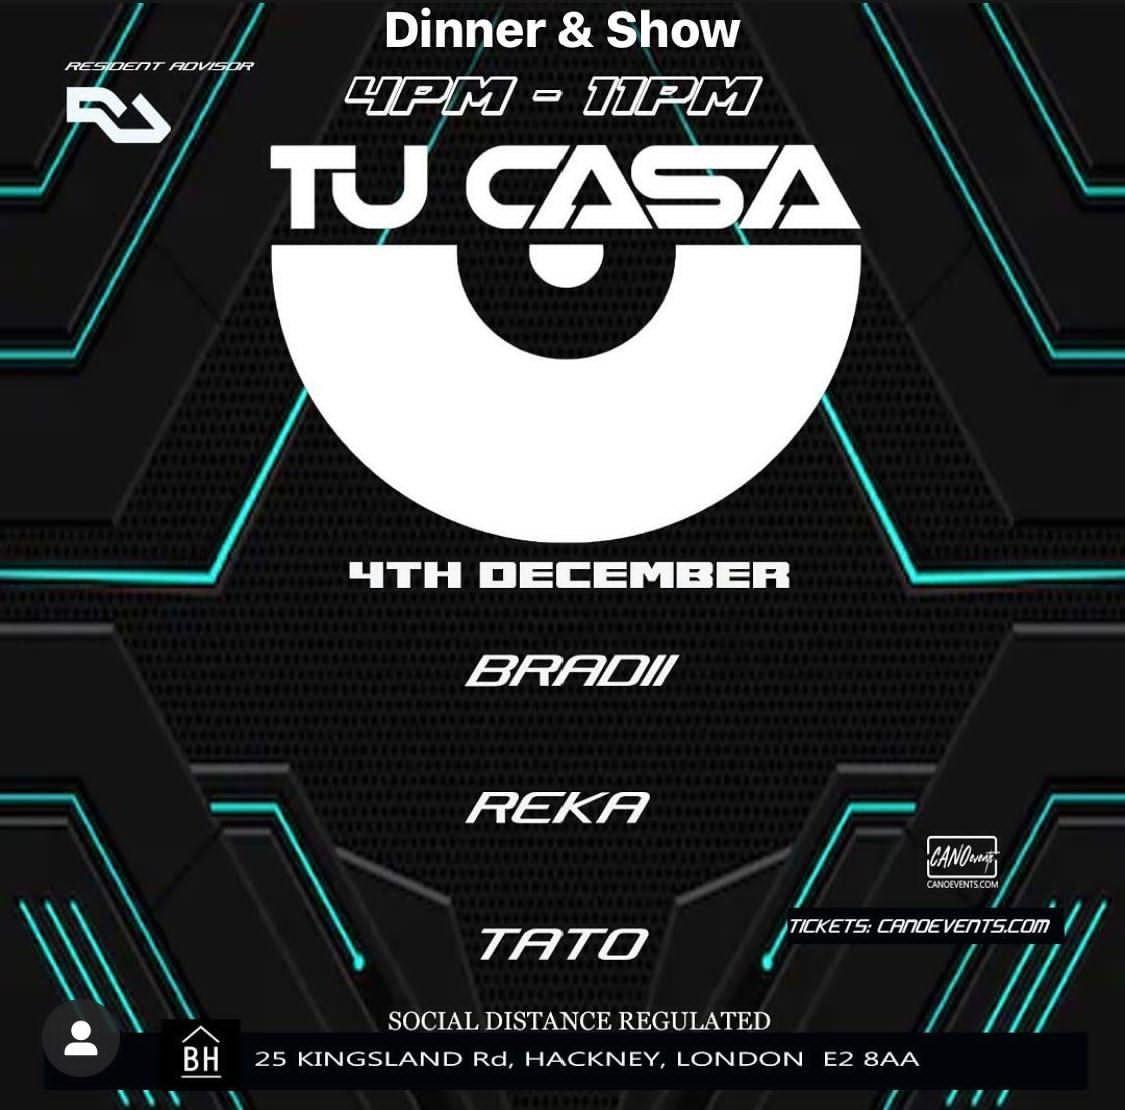 Tu Casa - Dinner & Show - Flyer front